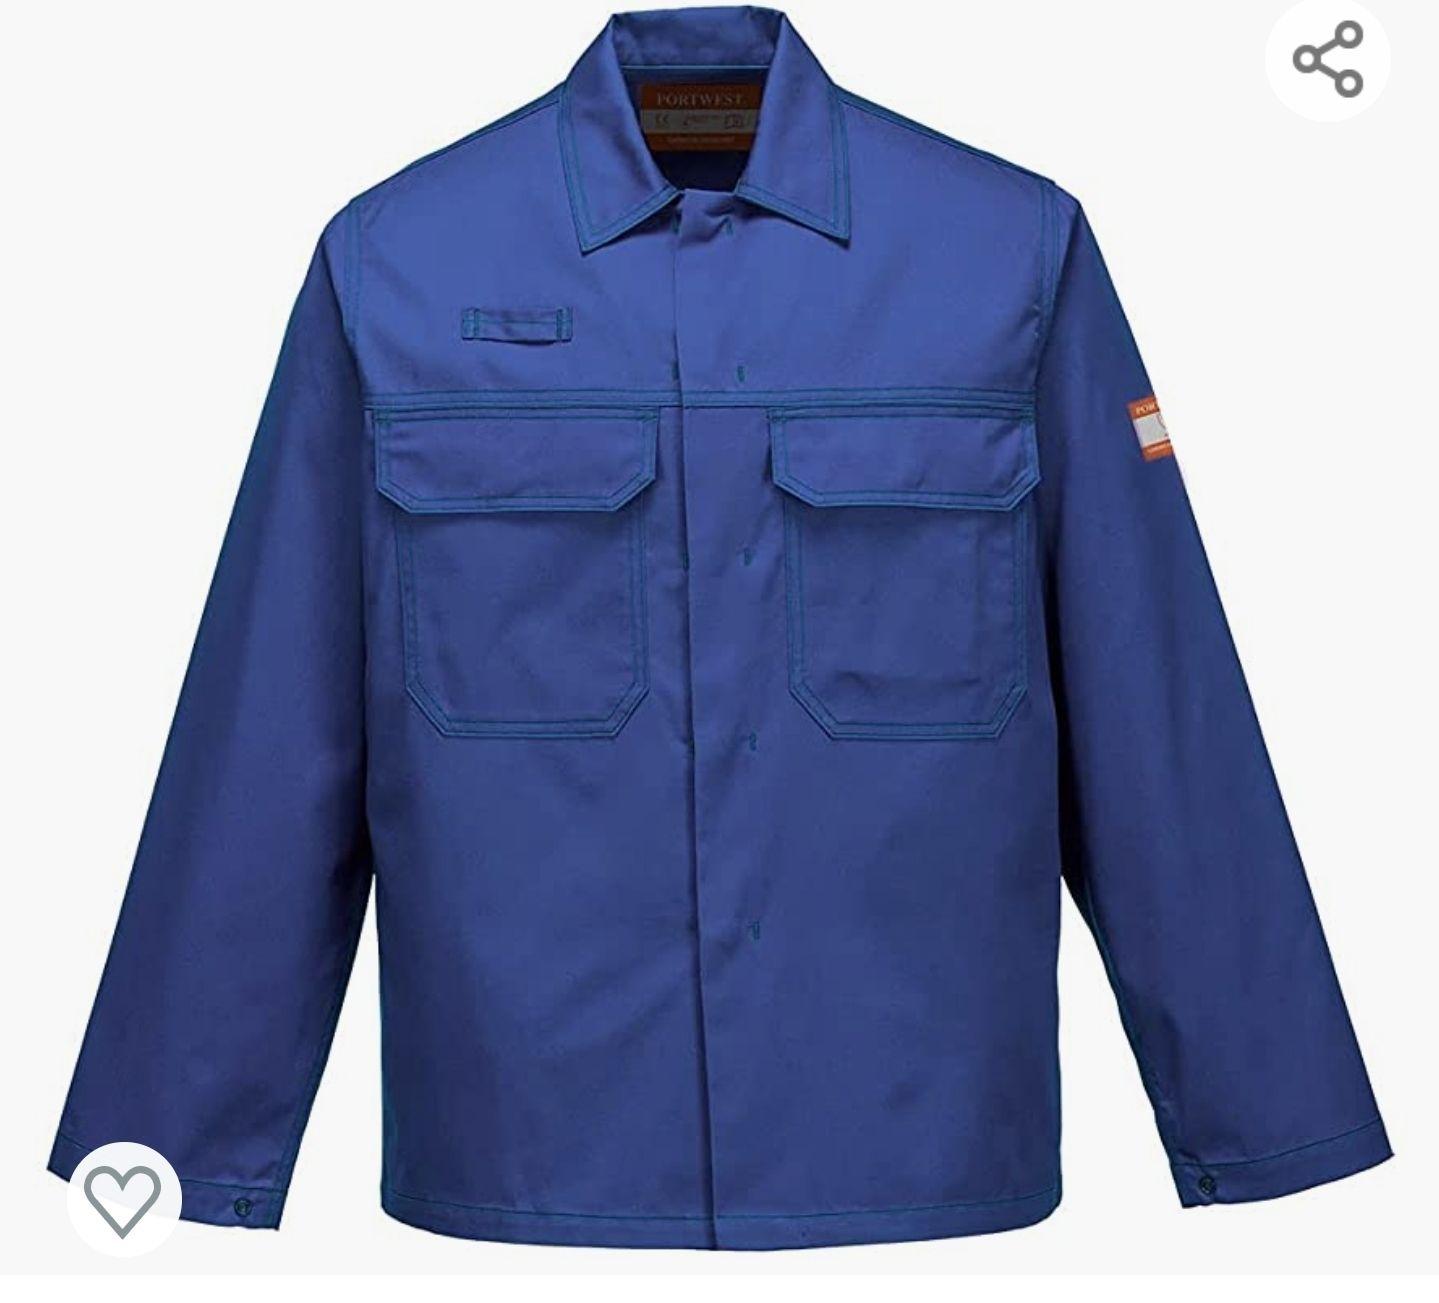 Chemical resistant Jacket size large £5.22 (+£4.49 non-prime) @ Amazon